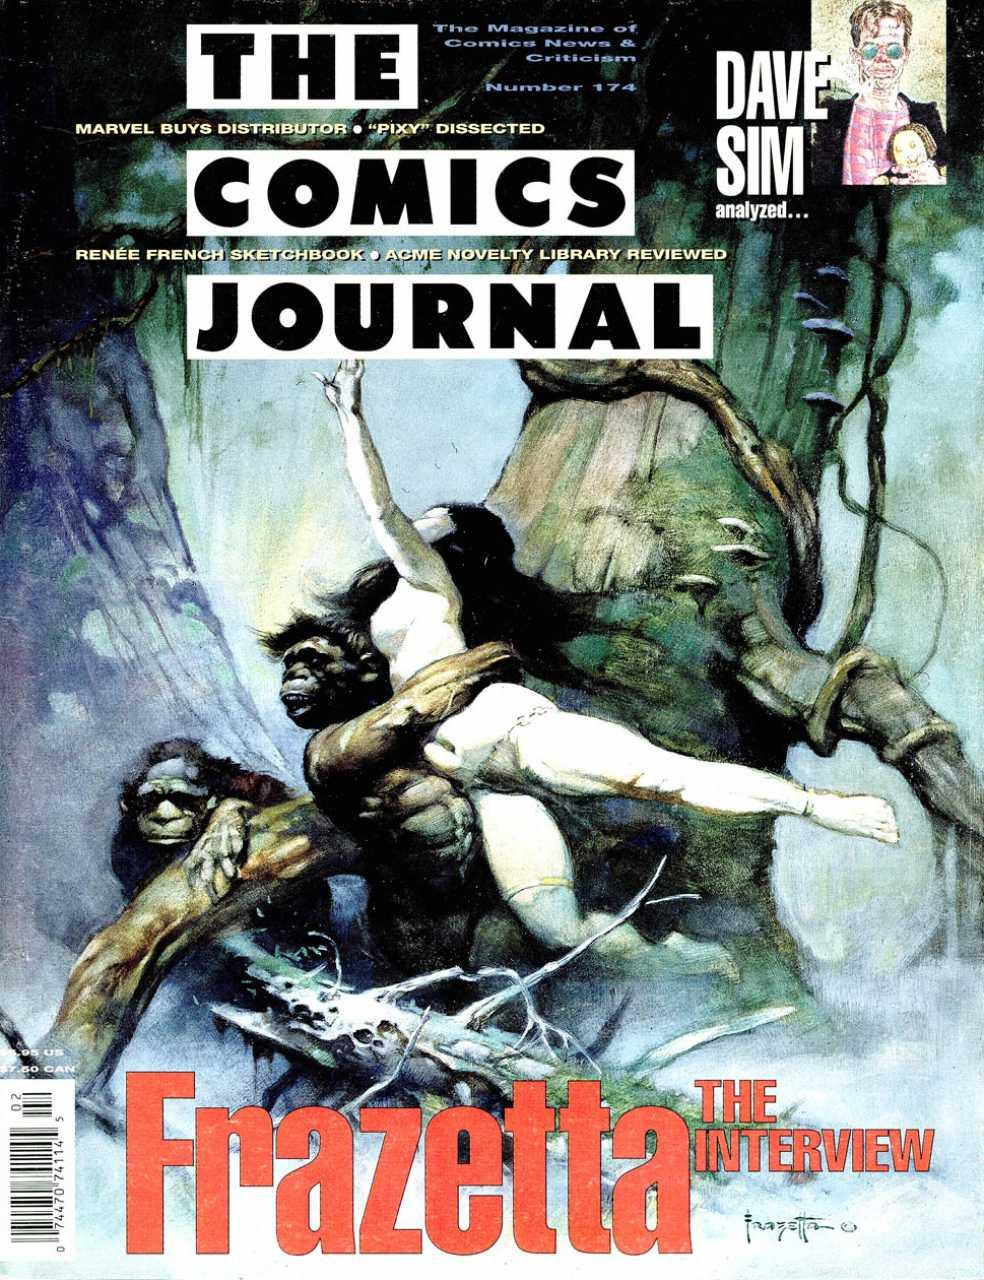 ComicsJournal